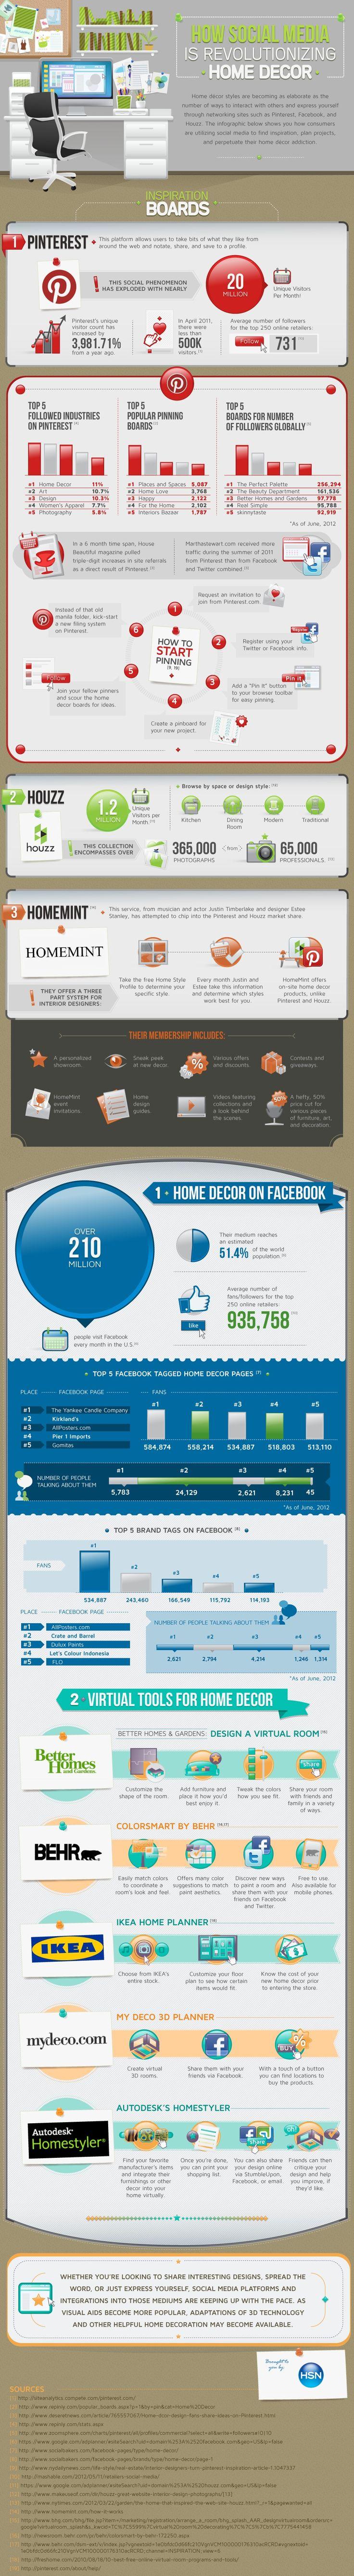 The 47 best Tech/Graph images on Pinterest | Social media, Community ...